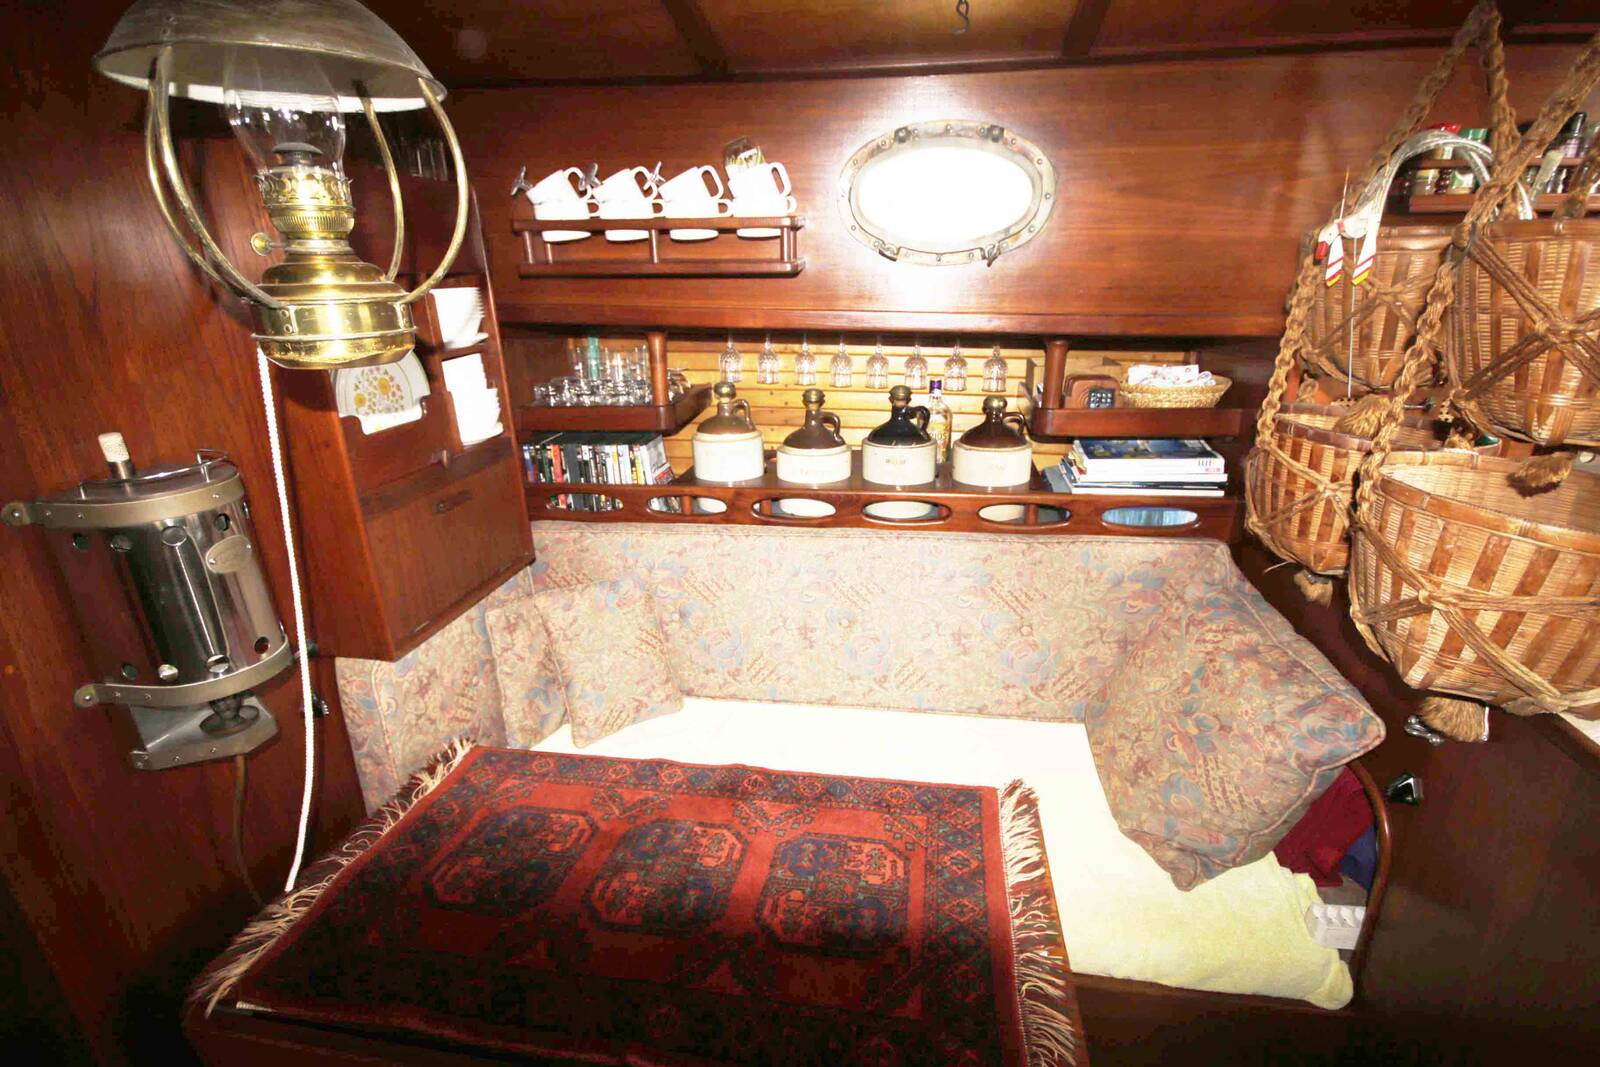 Alajuela 38 Sailing boat long keel boat drinks